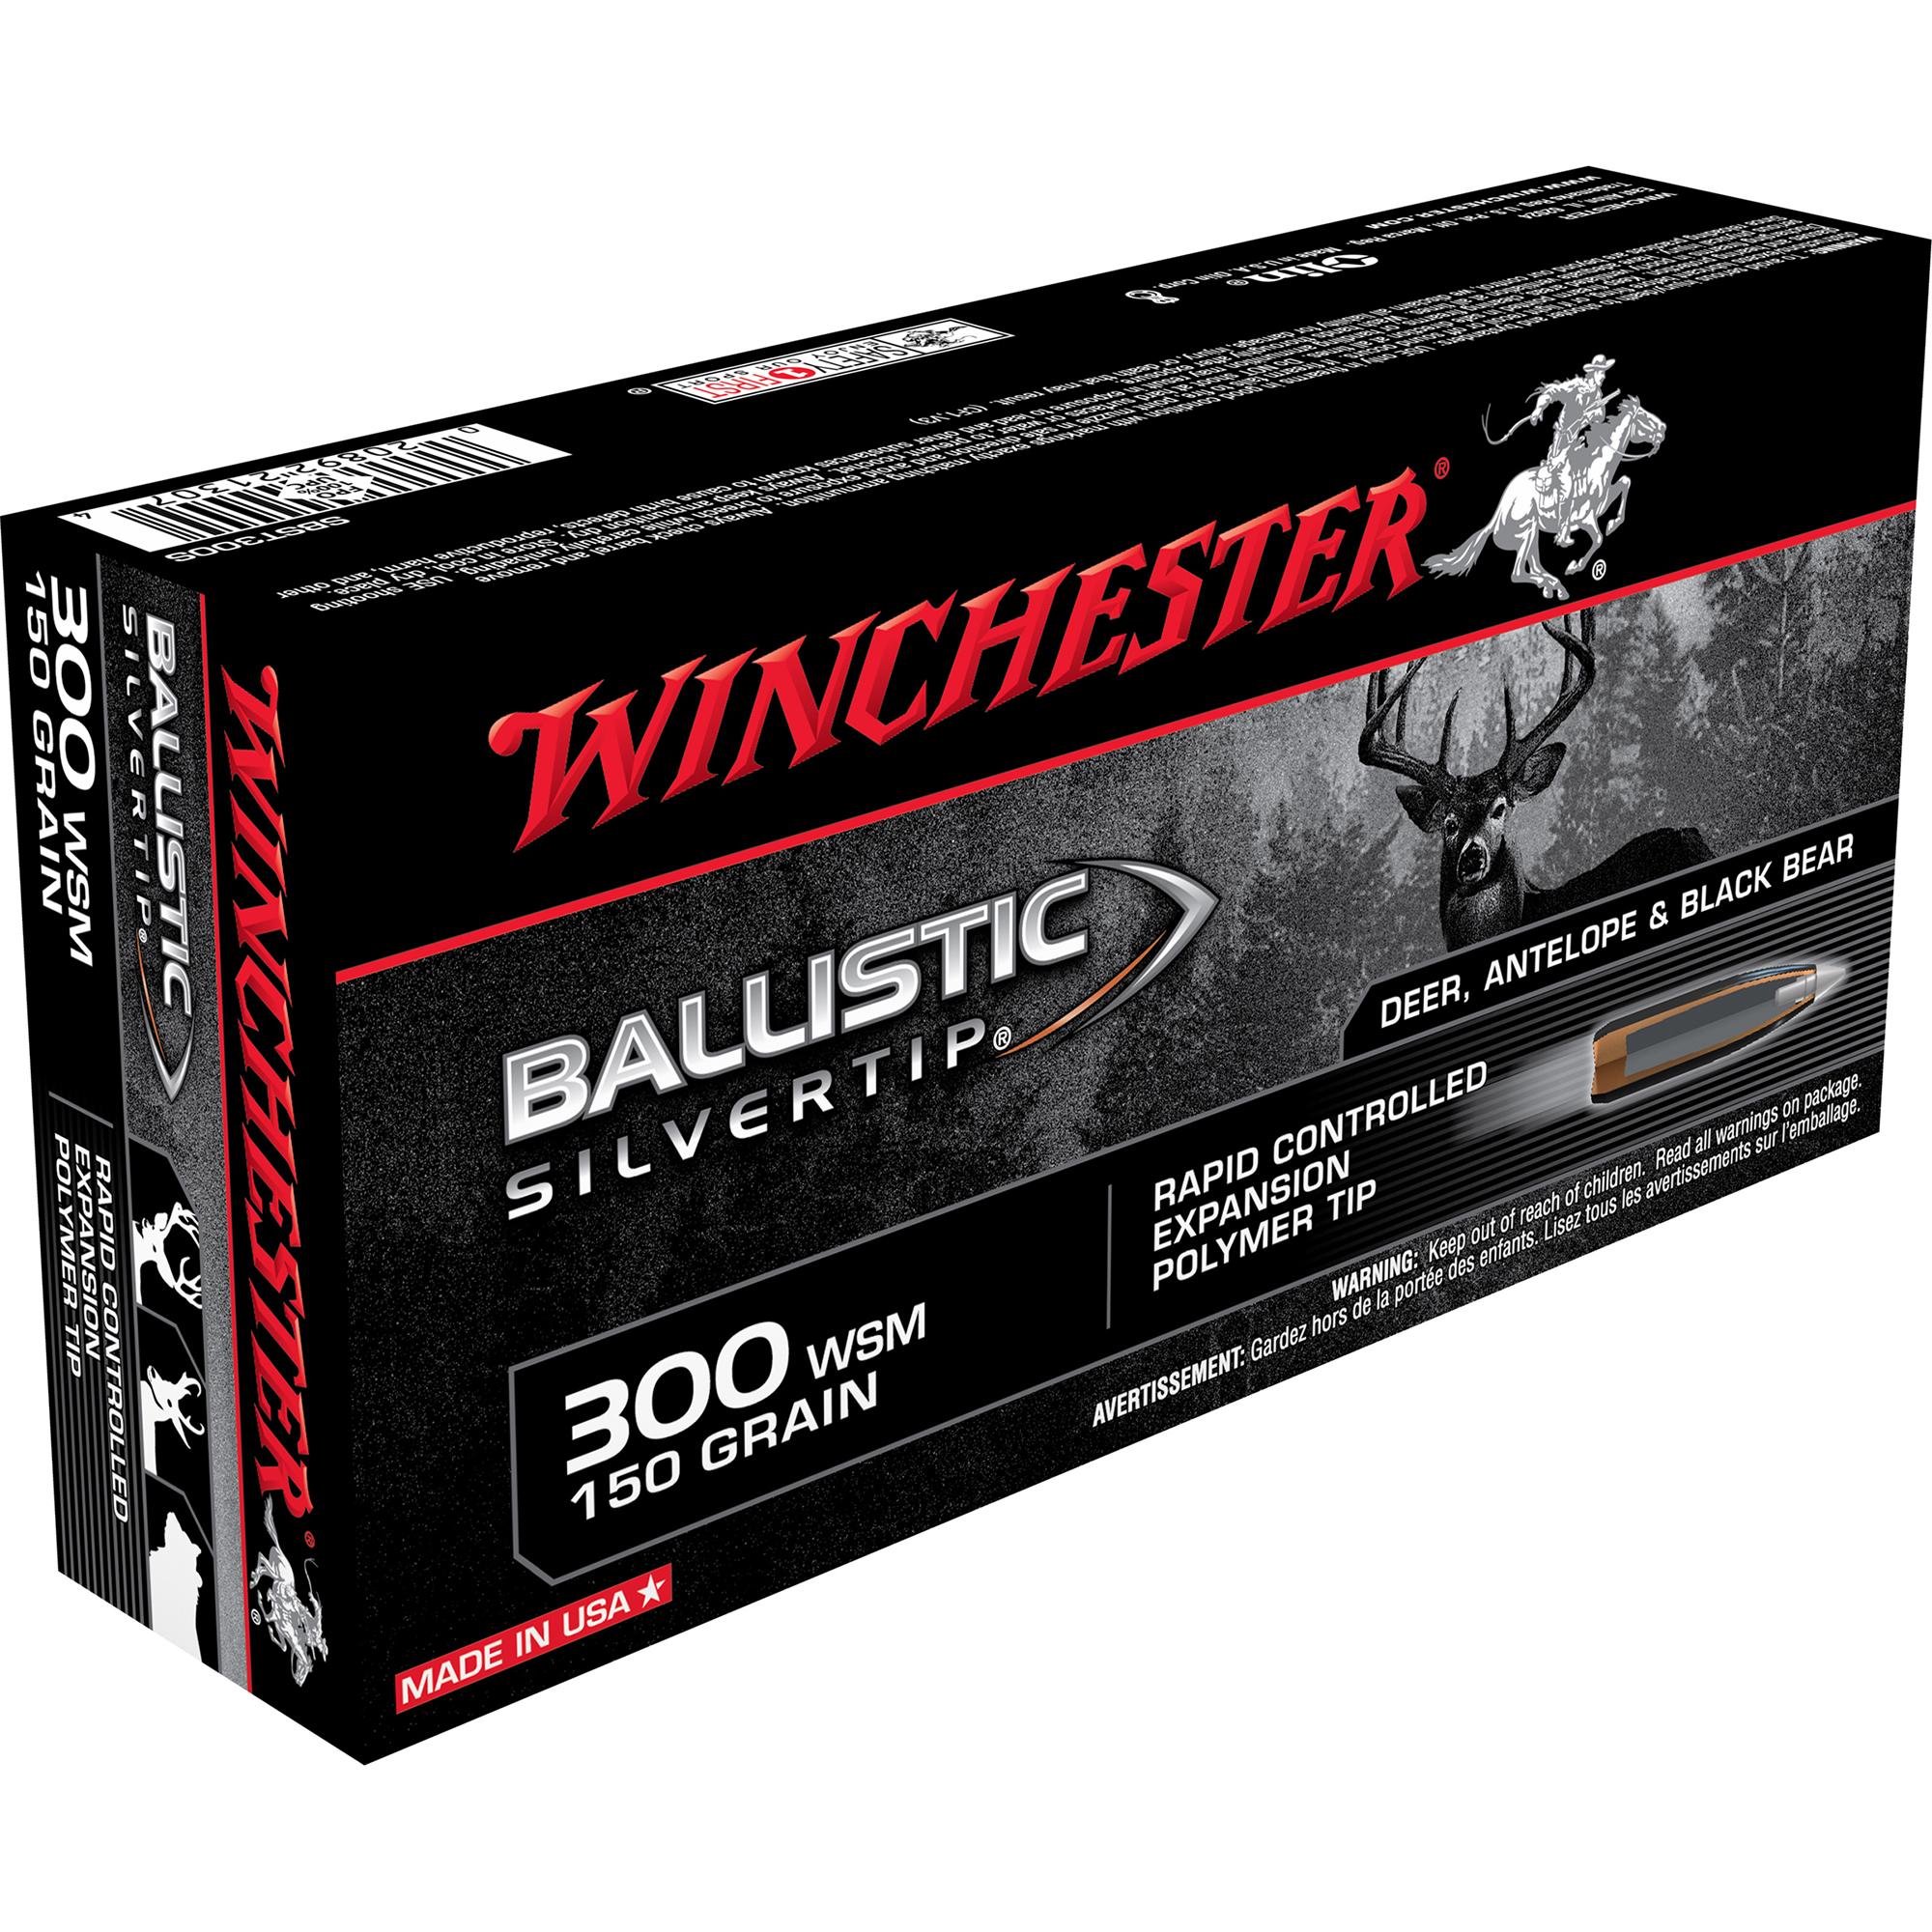 Winchester Ballistic Silver Tip Supreme Centerfire Ammo, .300 WSM, 150-gr.